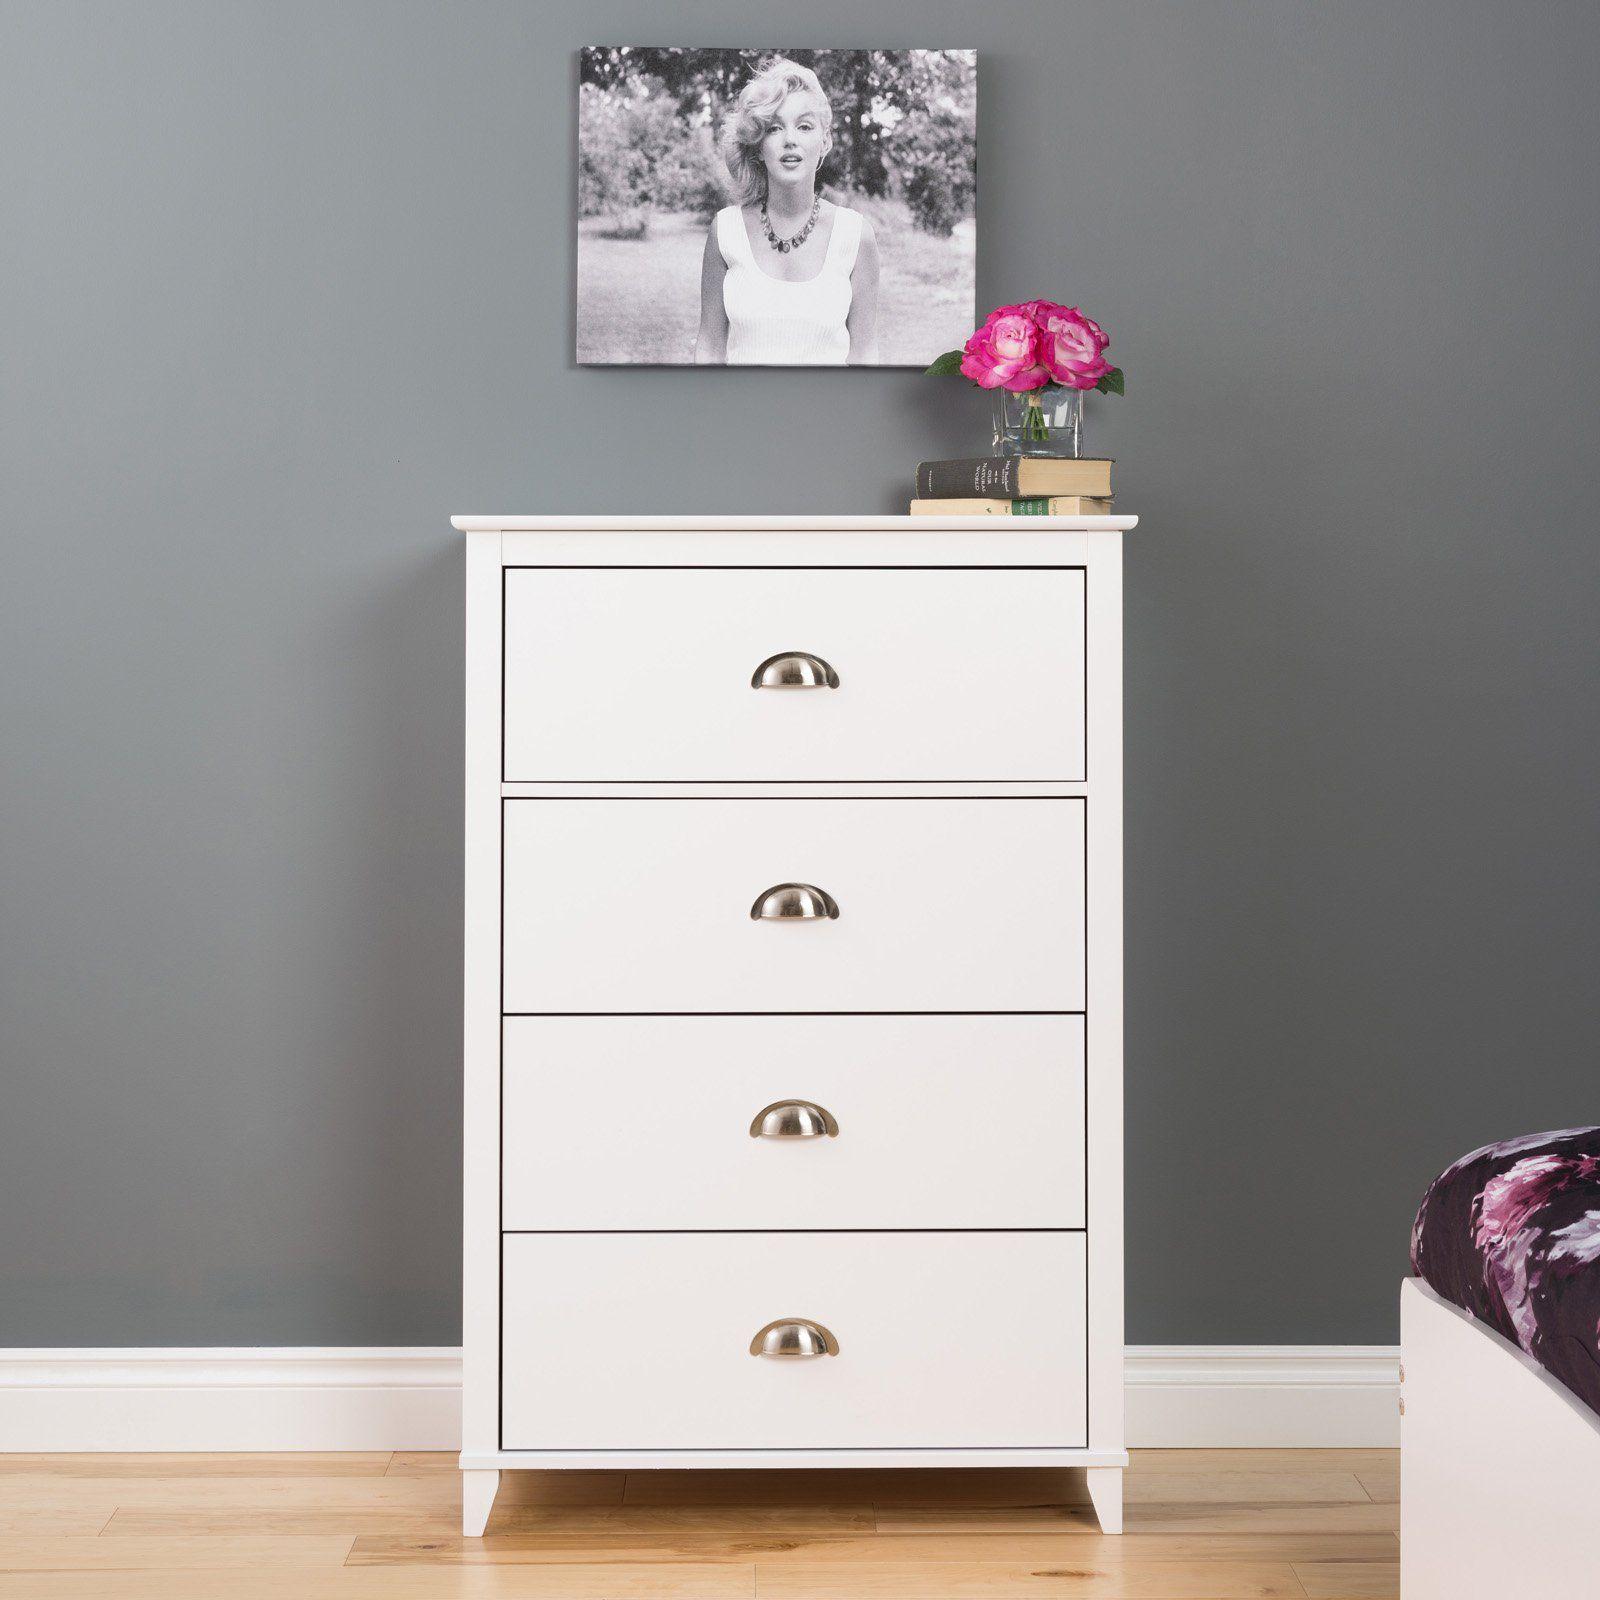 Prepac Yaletown 4 Drawer Chest Furniture White Chests Prepac [ 1600 x 1600 Pixel ]